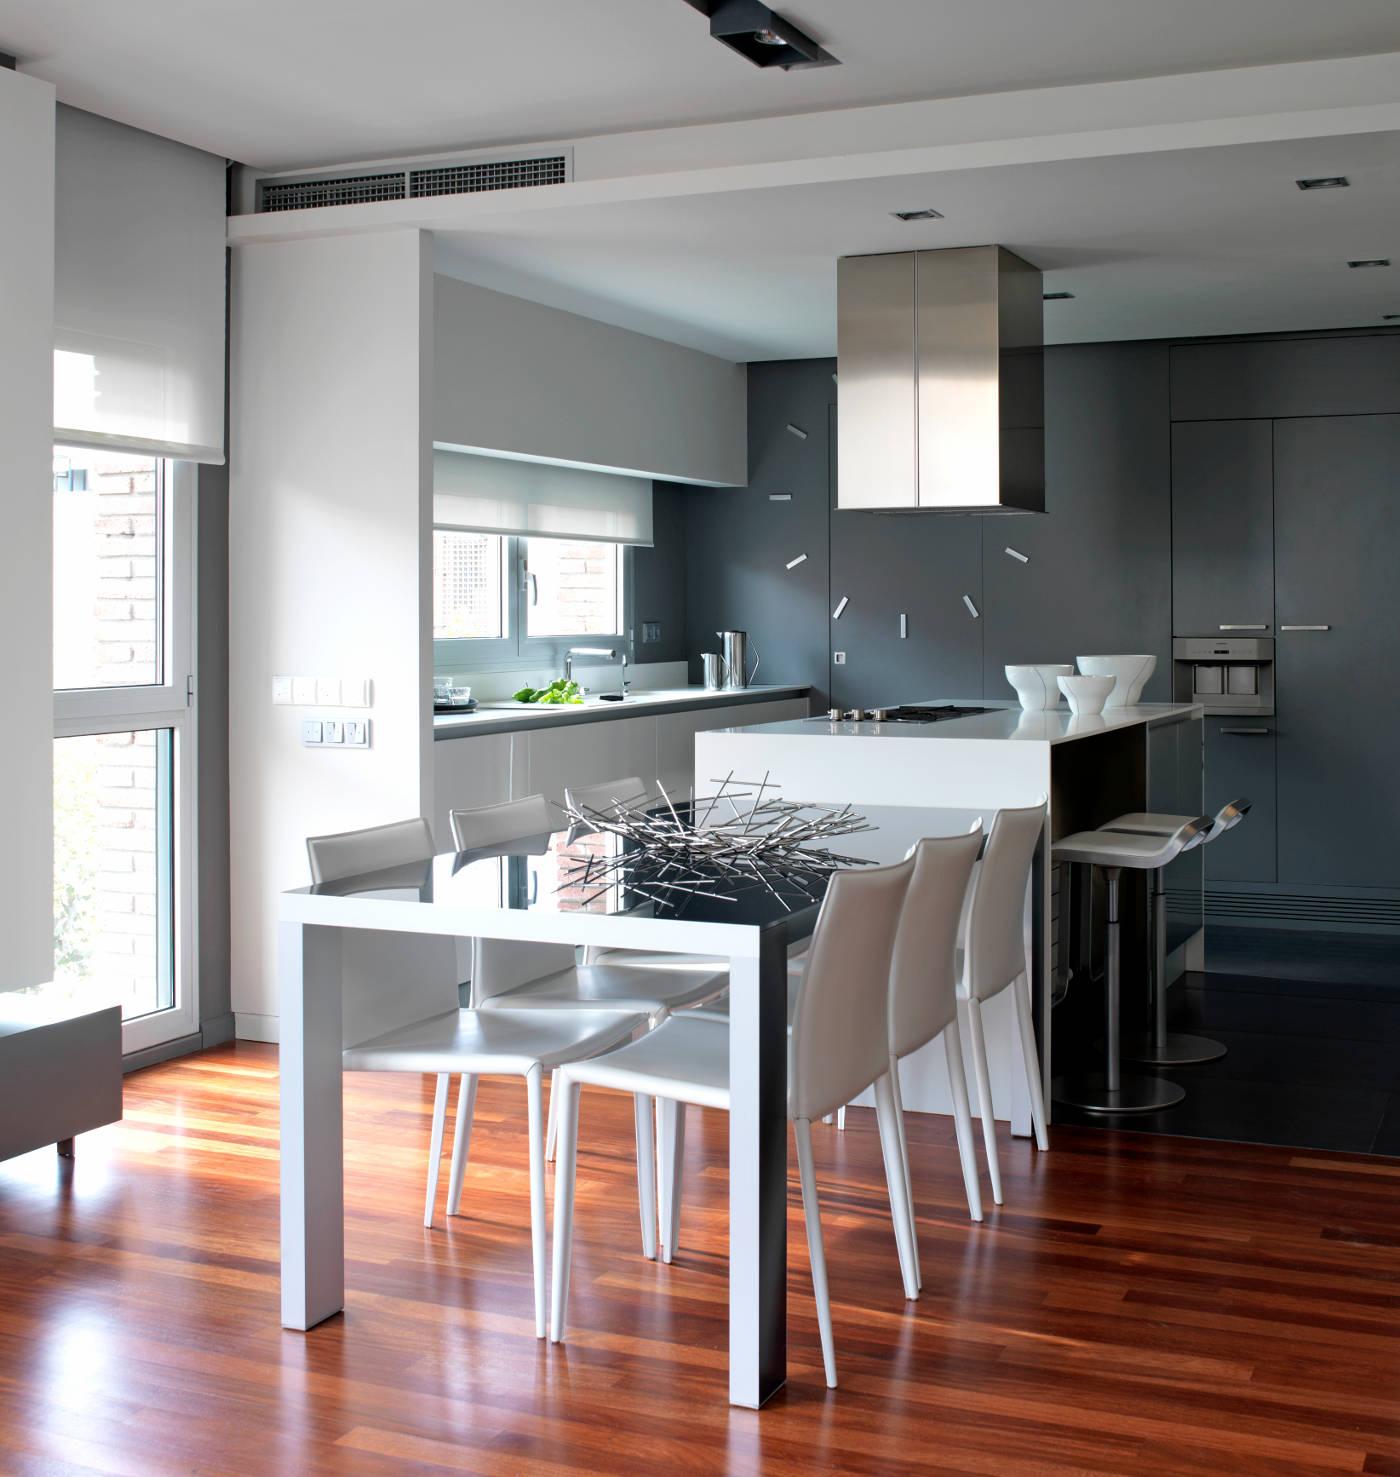 Vivienda Unifamiliar - Pau Alcover - Barcelona - Gloria Duran Arquitecto